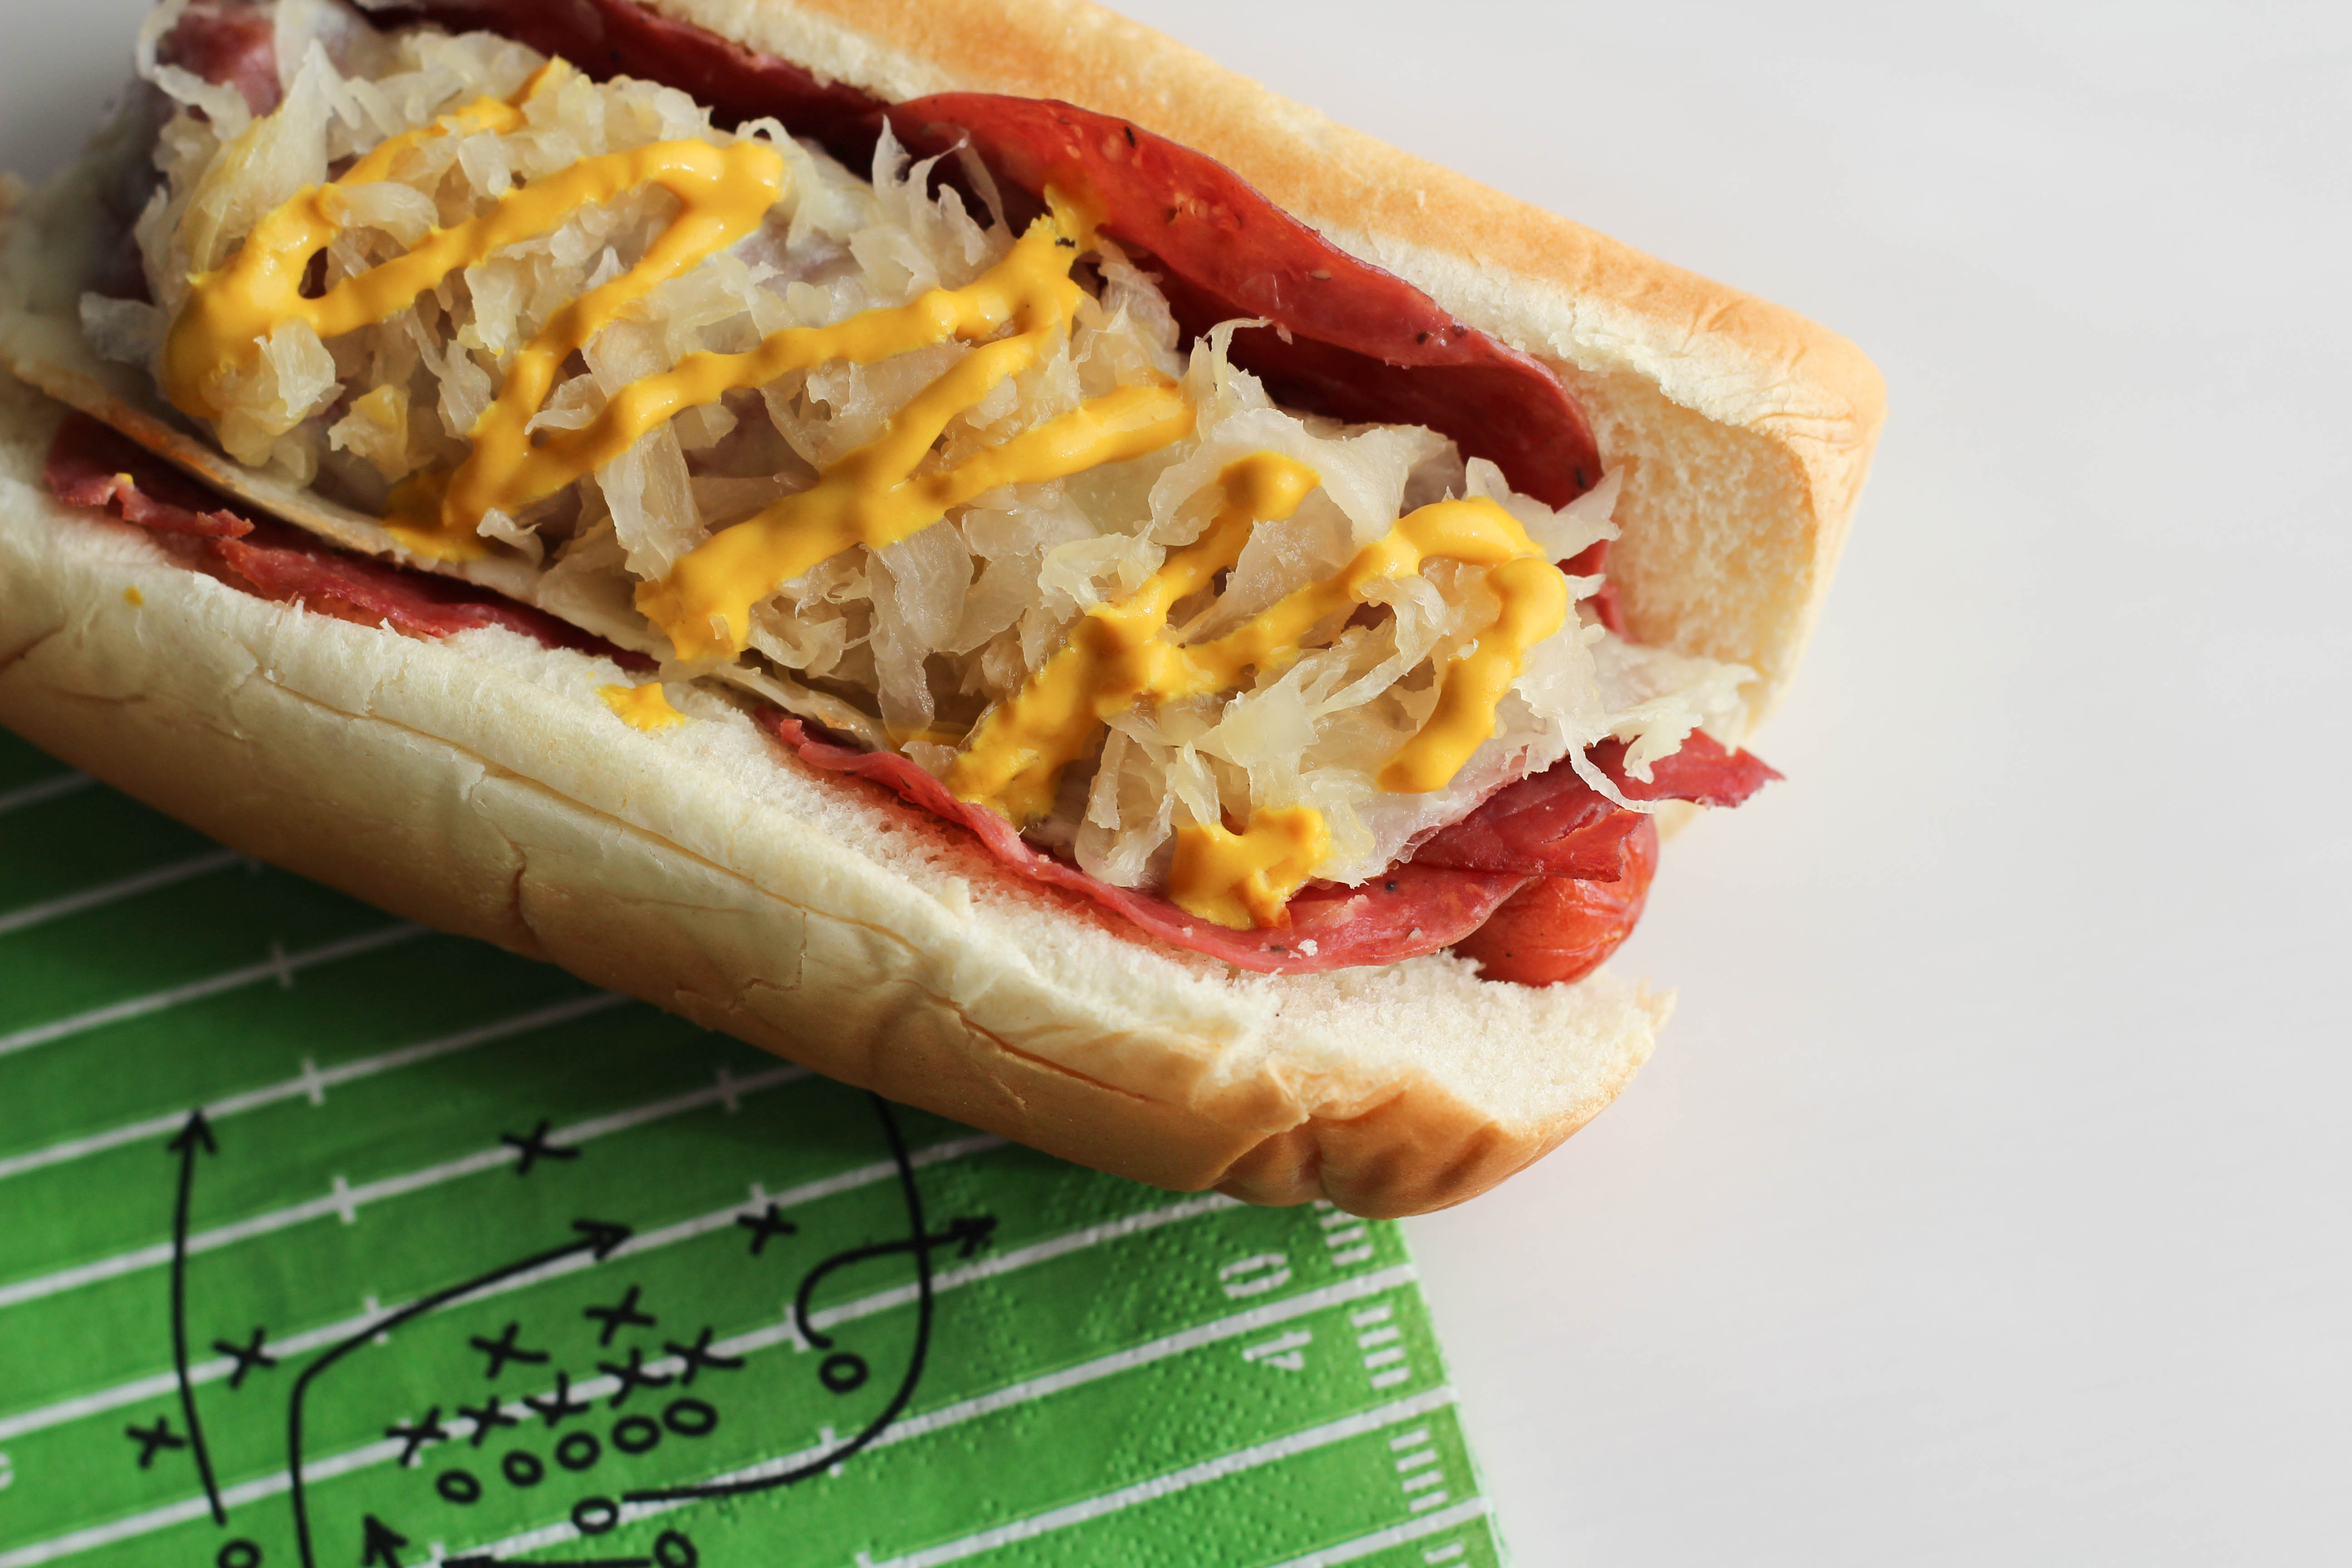 Creative Ways To Make Hot Dogs